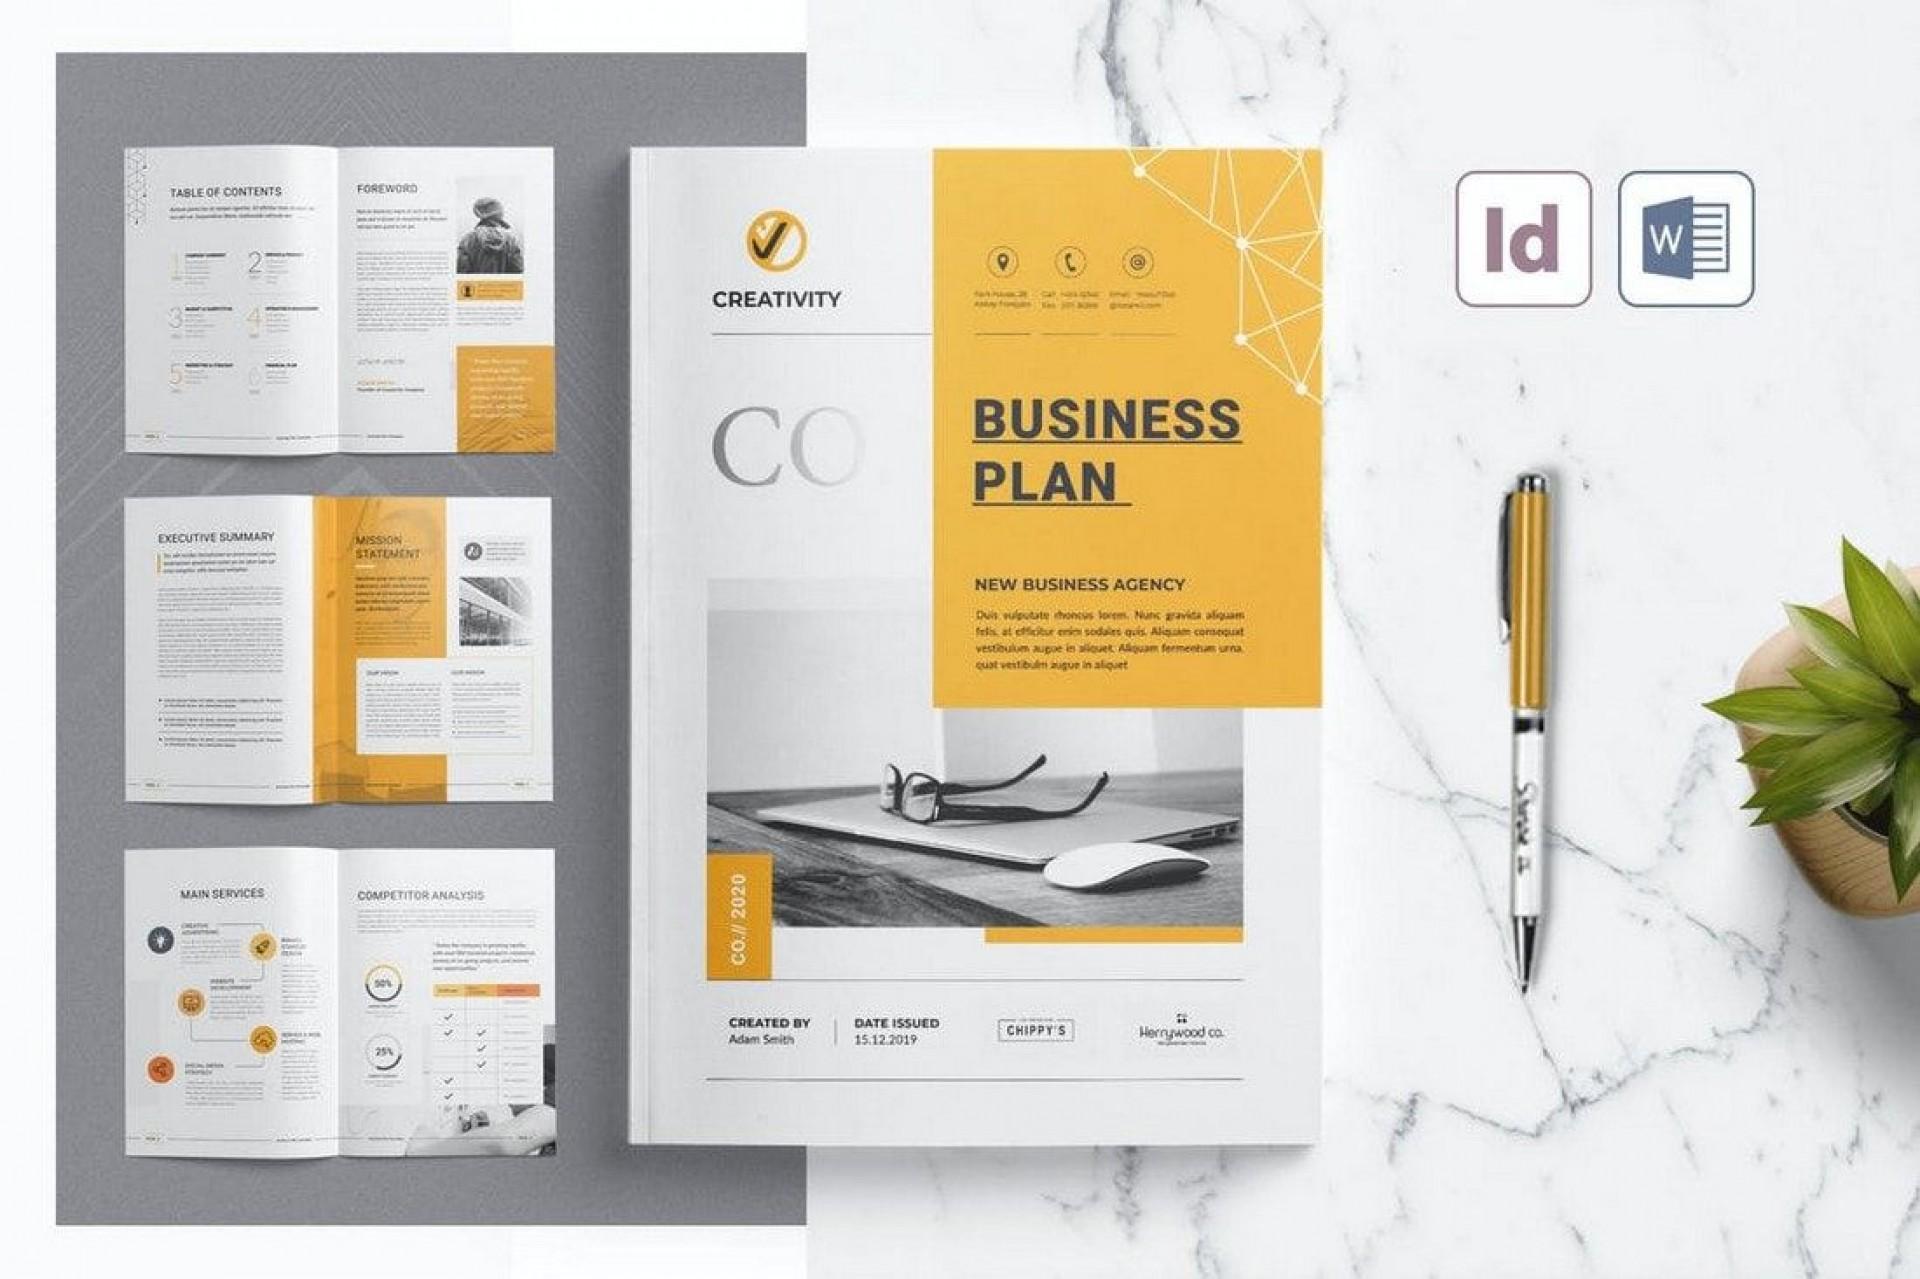 004 Dreaded M Word Travel Brochure Template Design  Microsoft Free1920